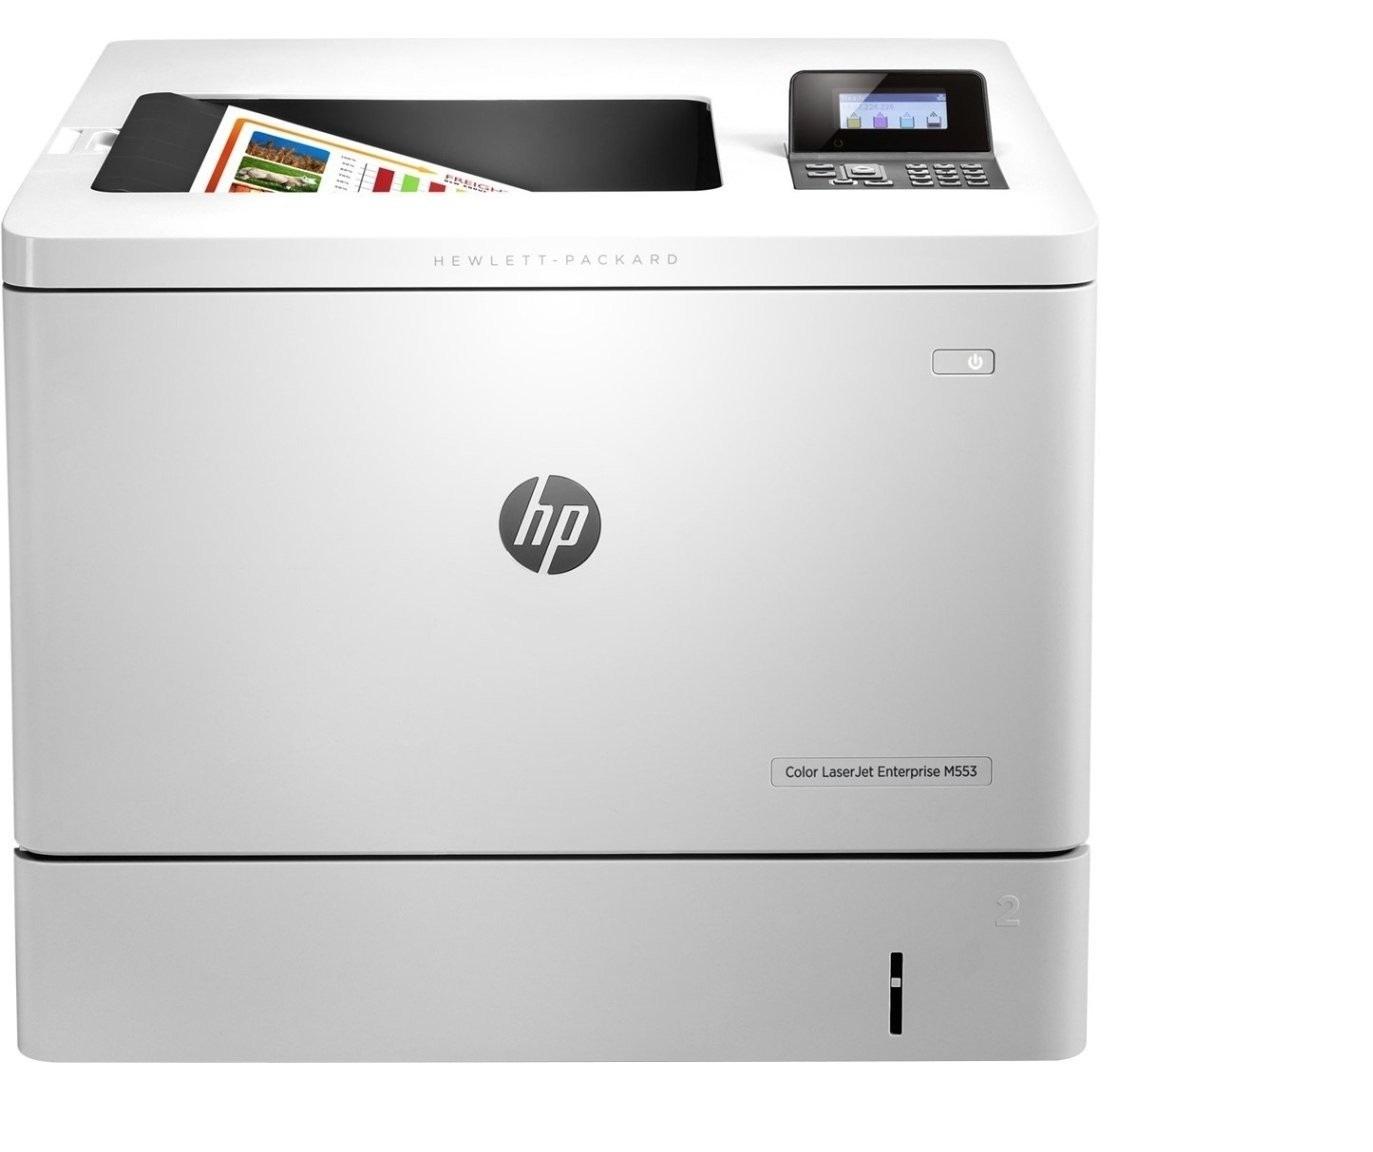 HP B5L24A#BGJ Color LaserJet Enterprise M553n Color USB Ethernet Printer Demo 41 Pages